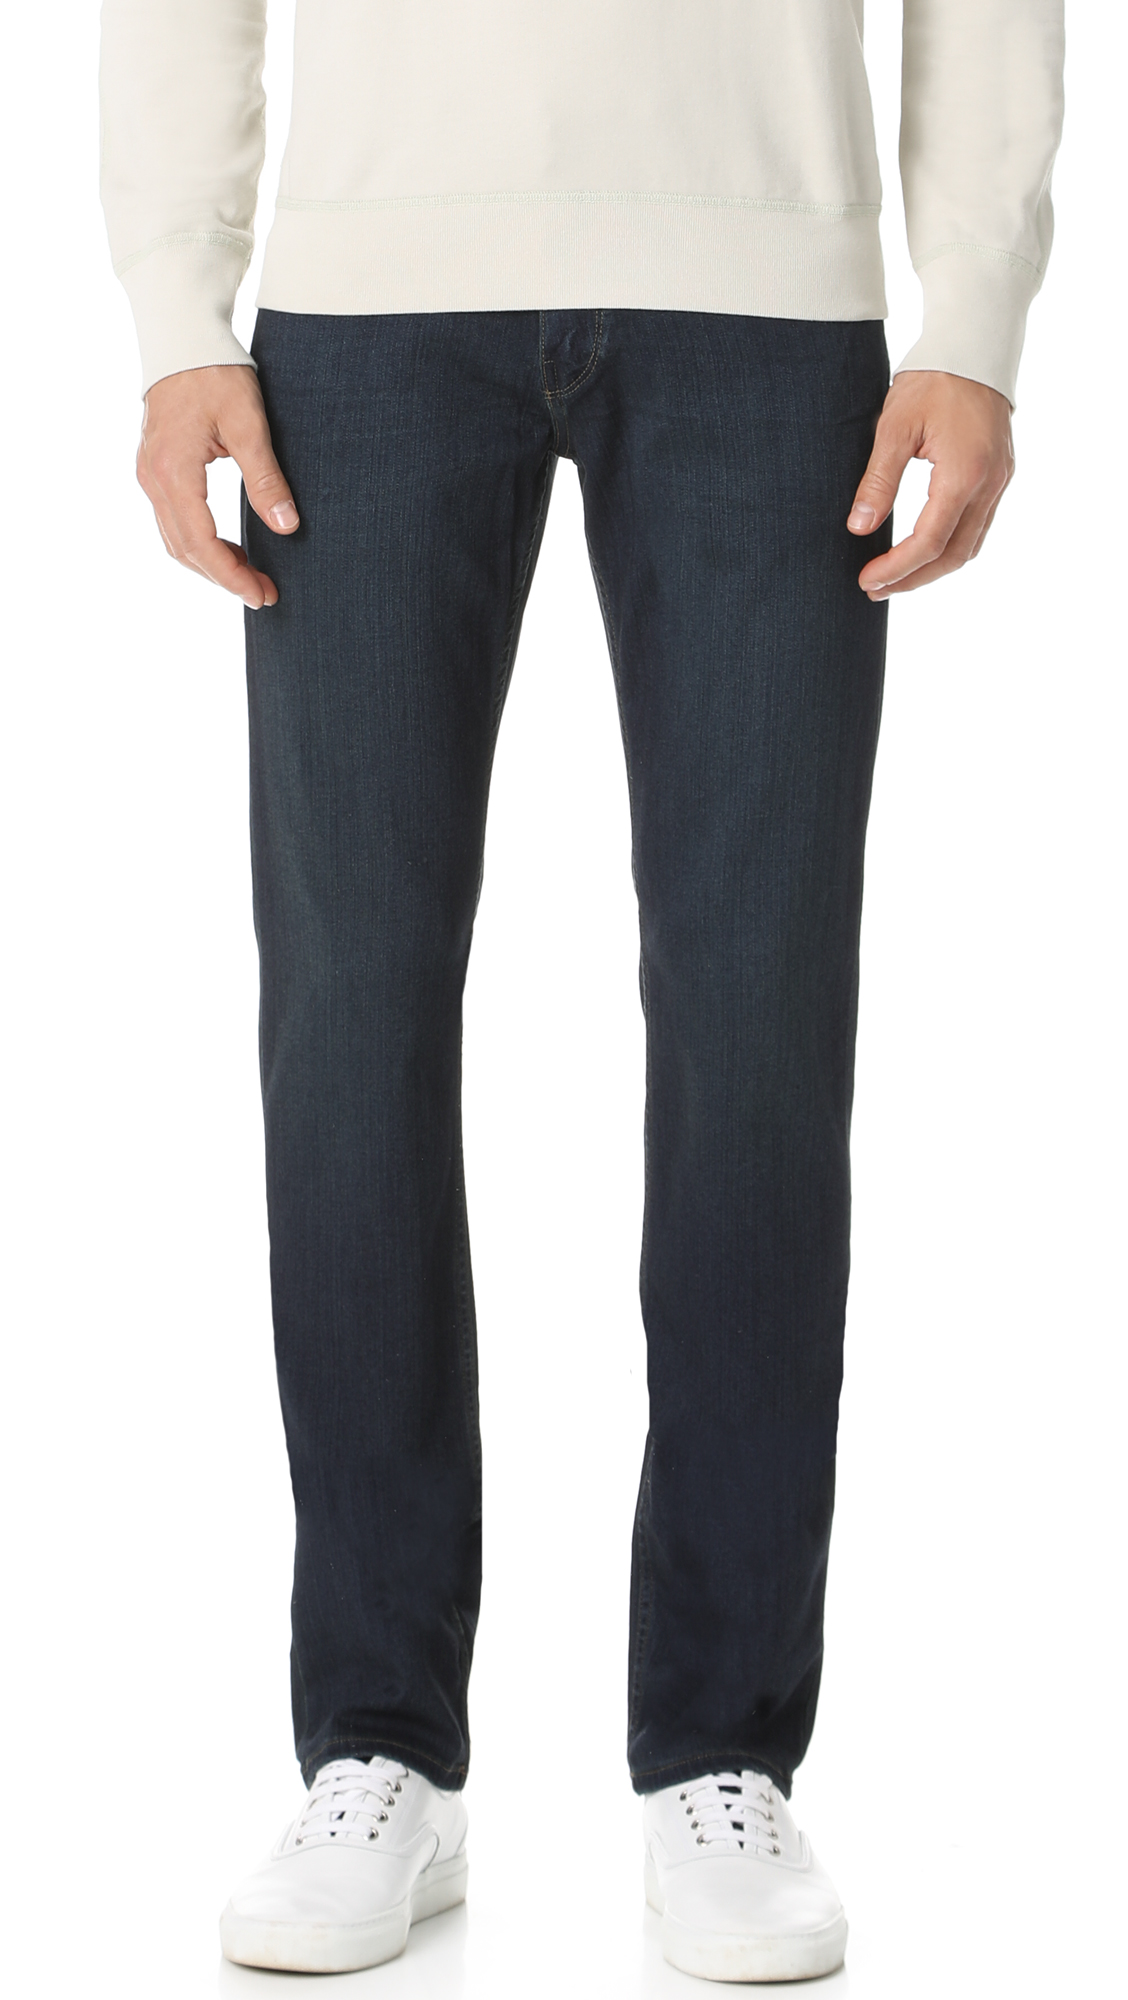 Normandie Cellar Jeans